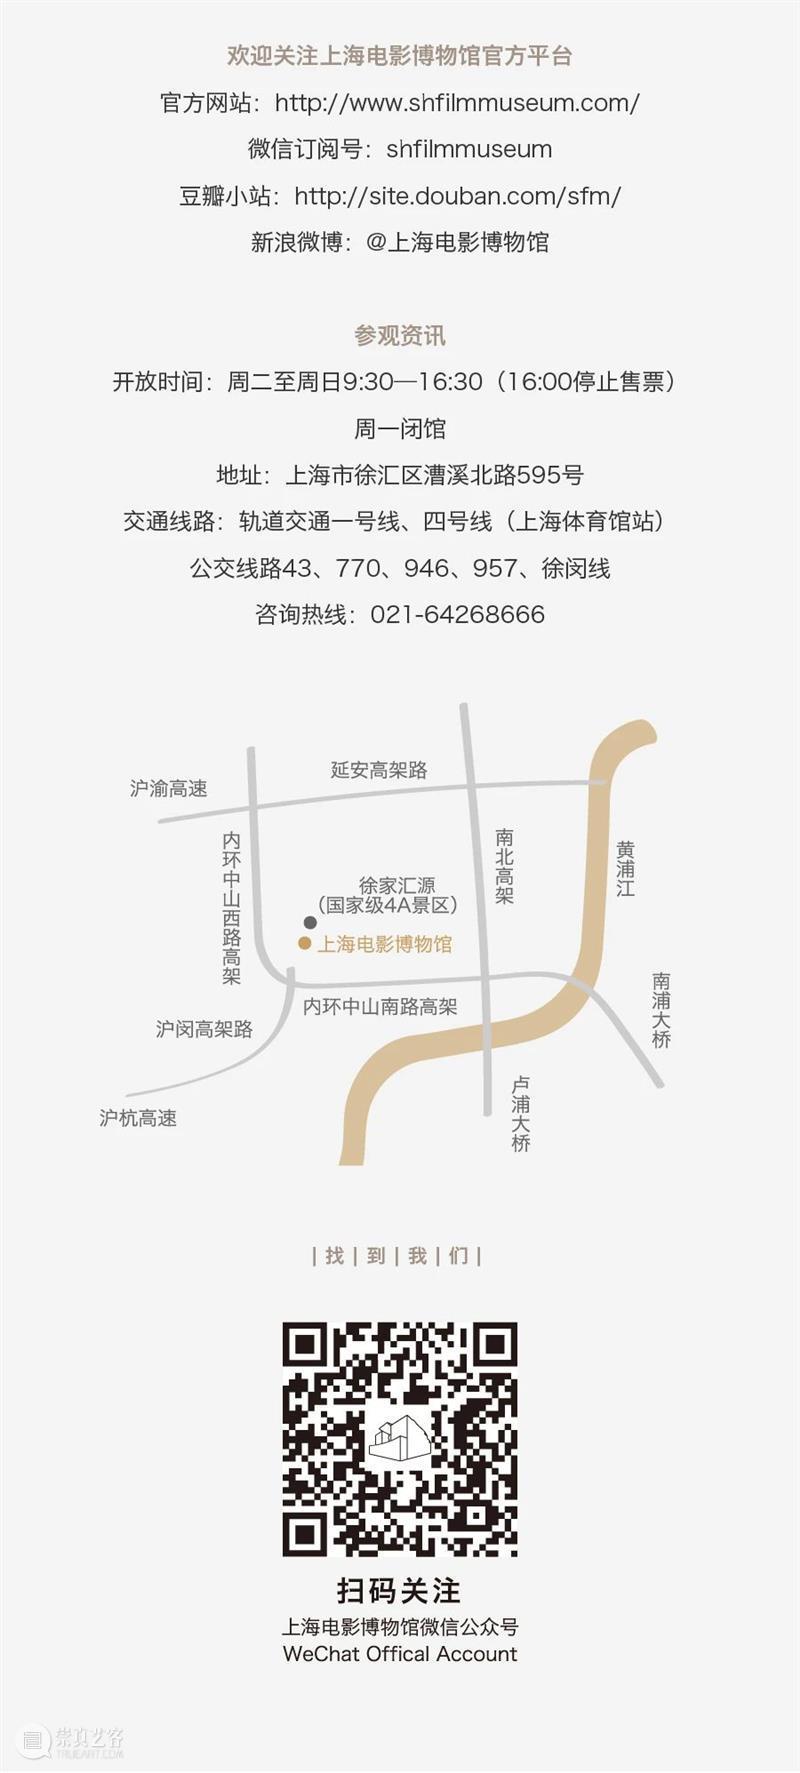 SFM·595微电台 VOL92:上影厂的第一年(下) 上影厂 SFM 微电台 VOL92 上海电影制片厂 中国 电影 企业 基地 上海长江电影制片厂 昆仑影业公司 崇真艺客